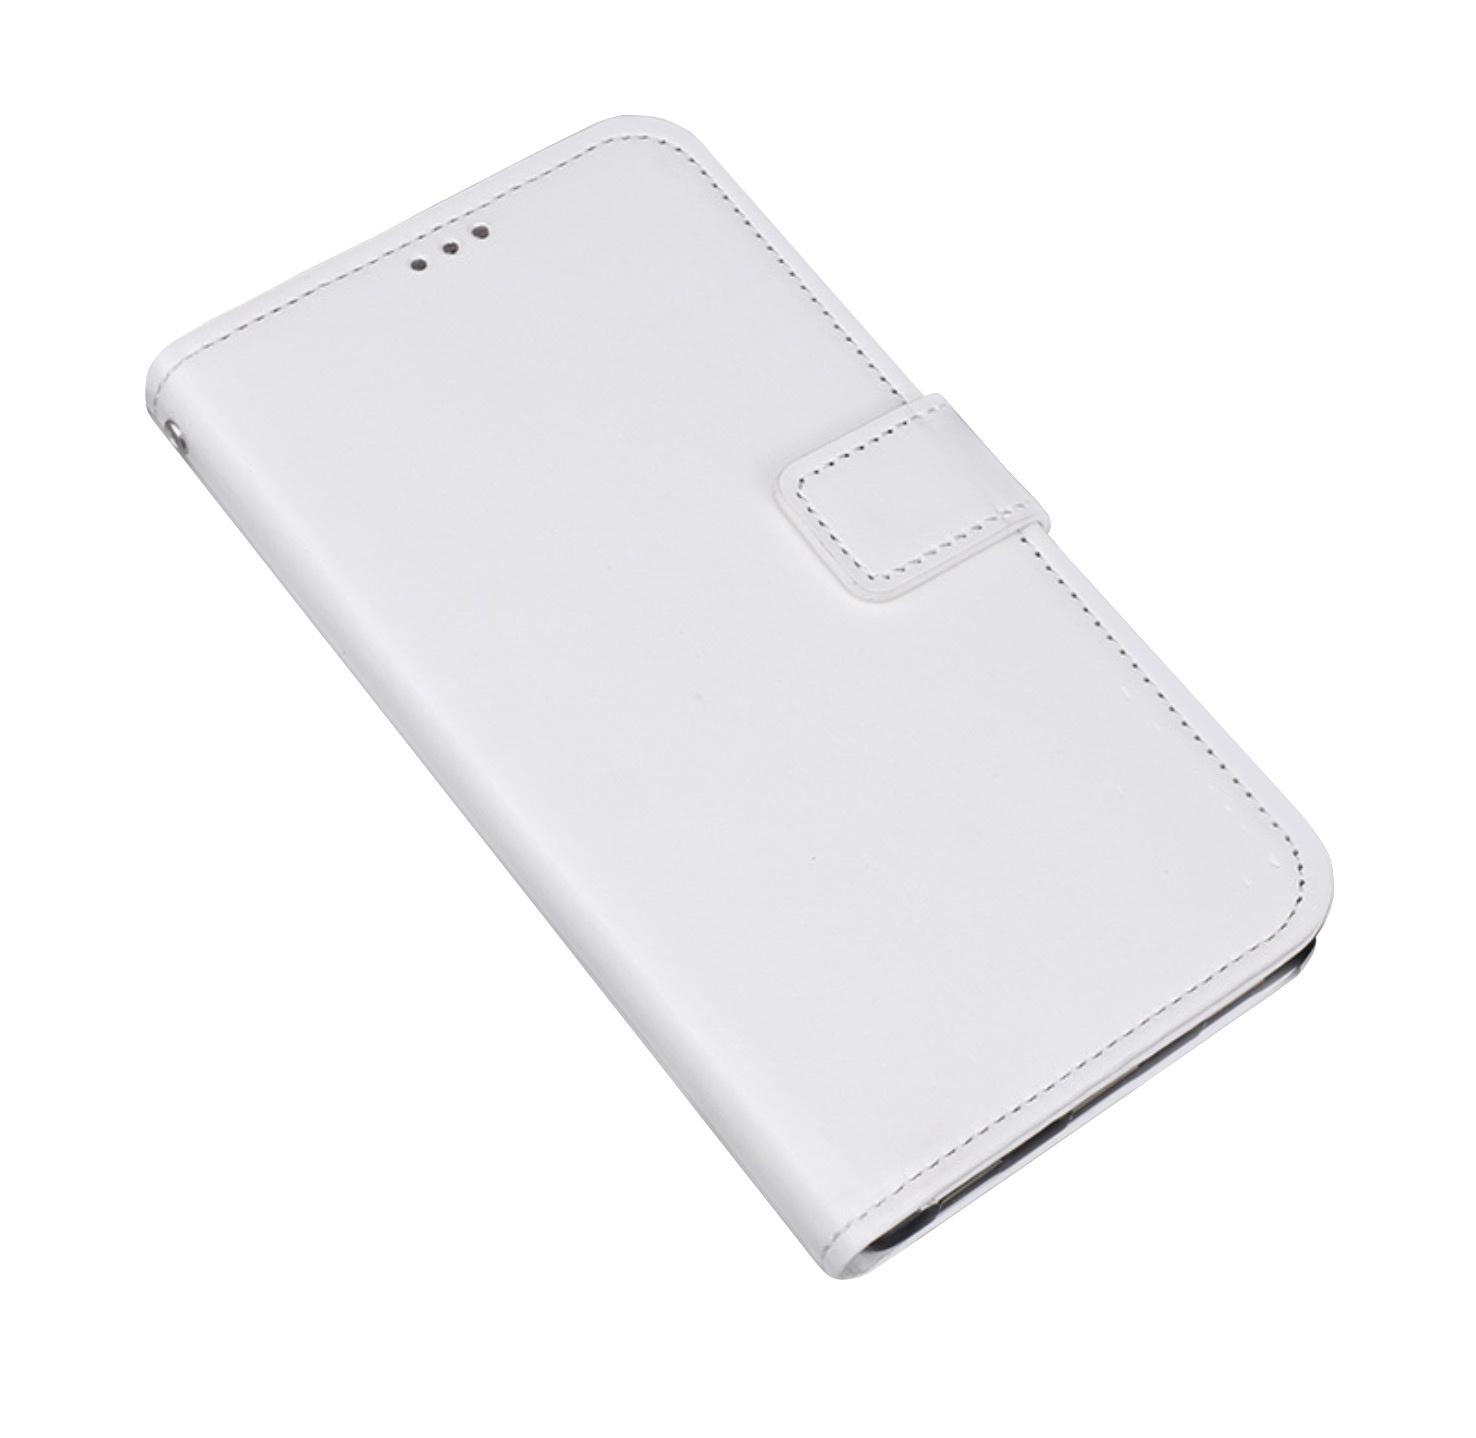 Чехол-книжка MyPads для Alcatel 1X 5059D с мульти-подставкой застёжкой и визитницей белый смартфон alcatel 1x 5059d black